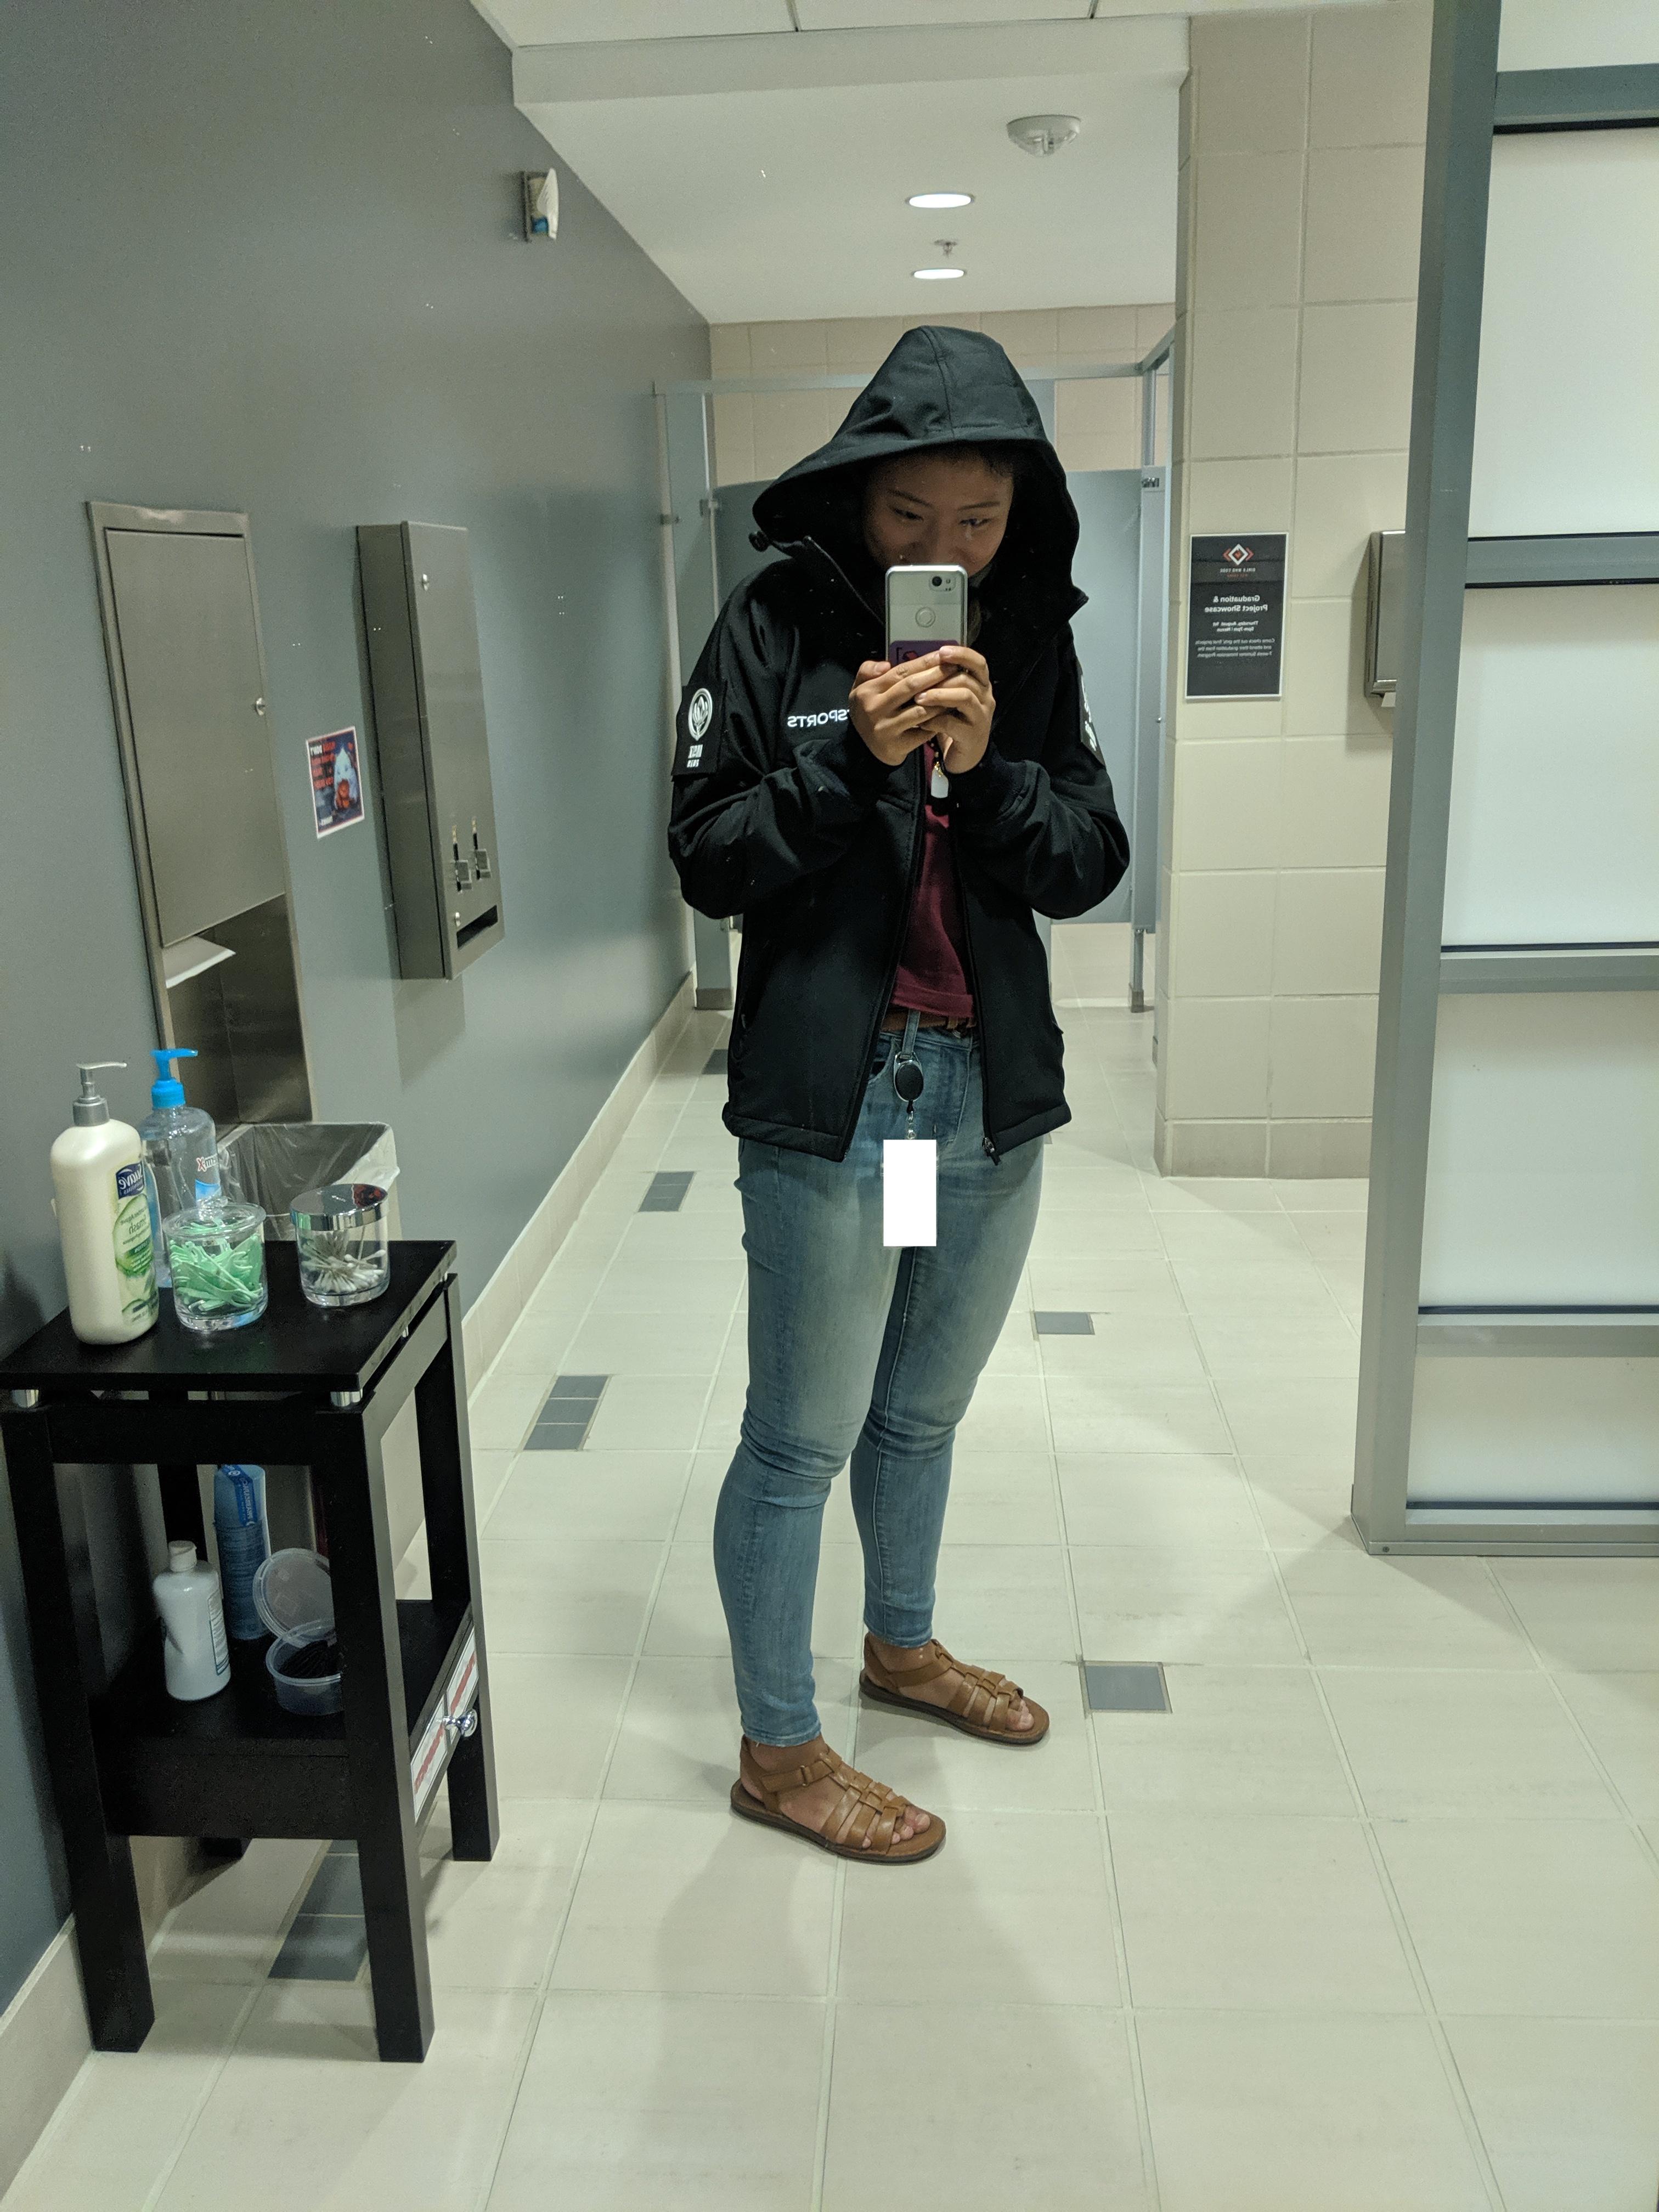 L33t jacket